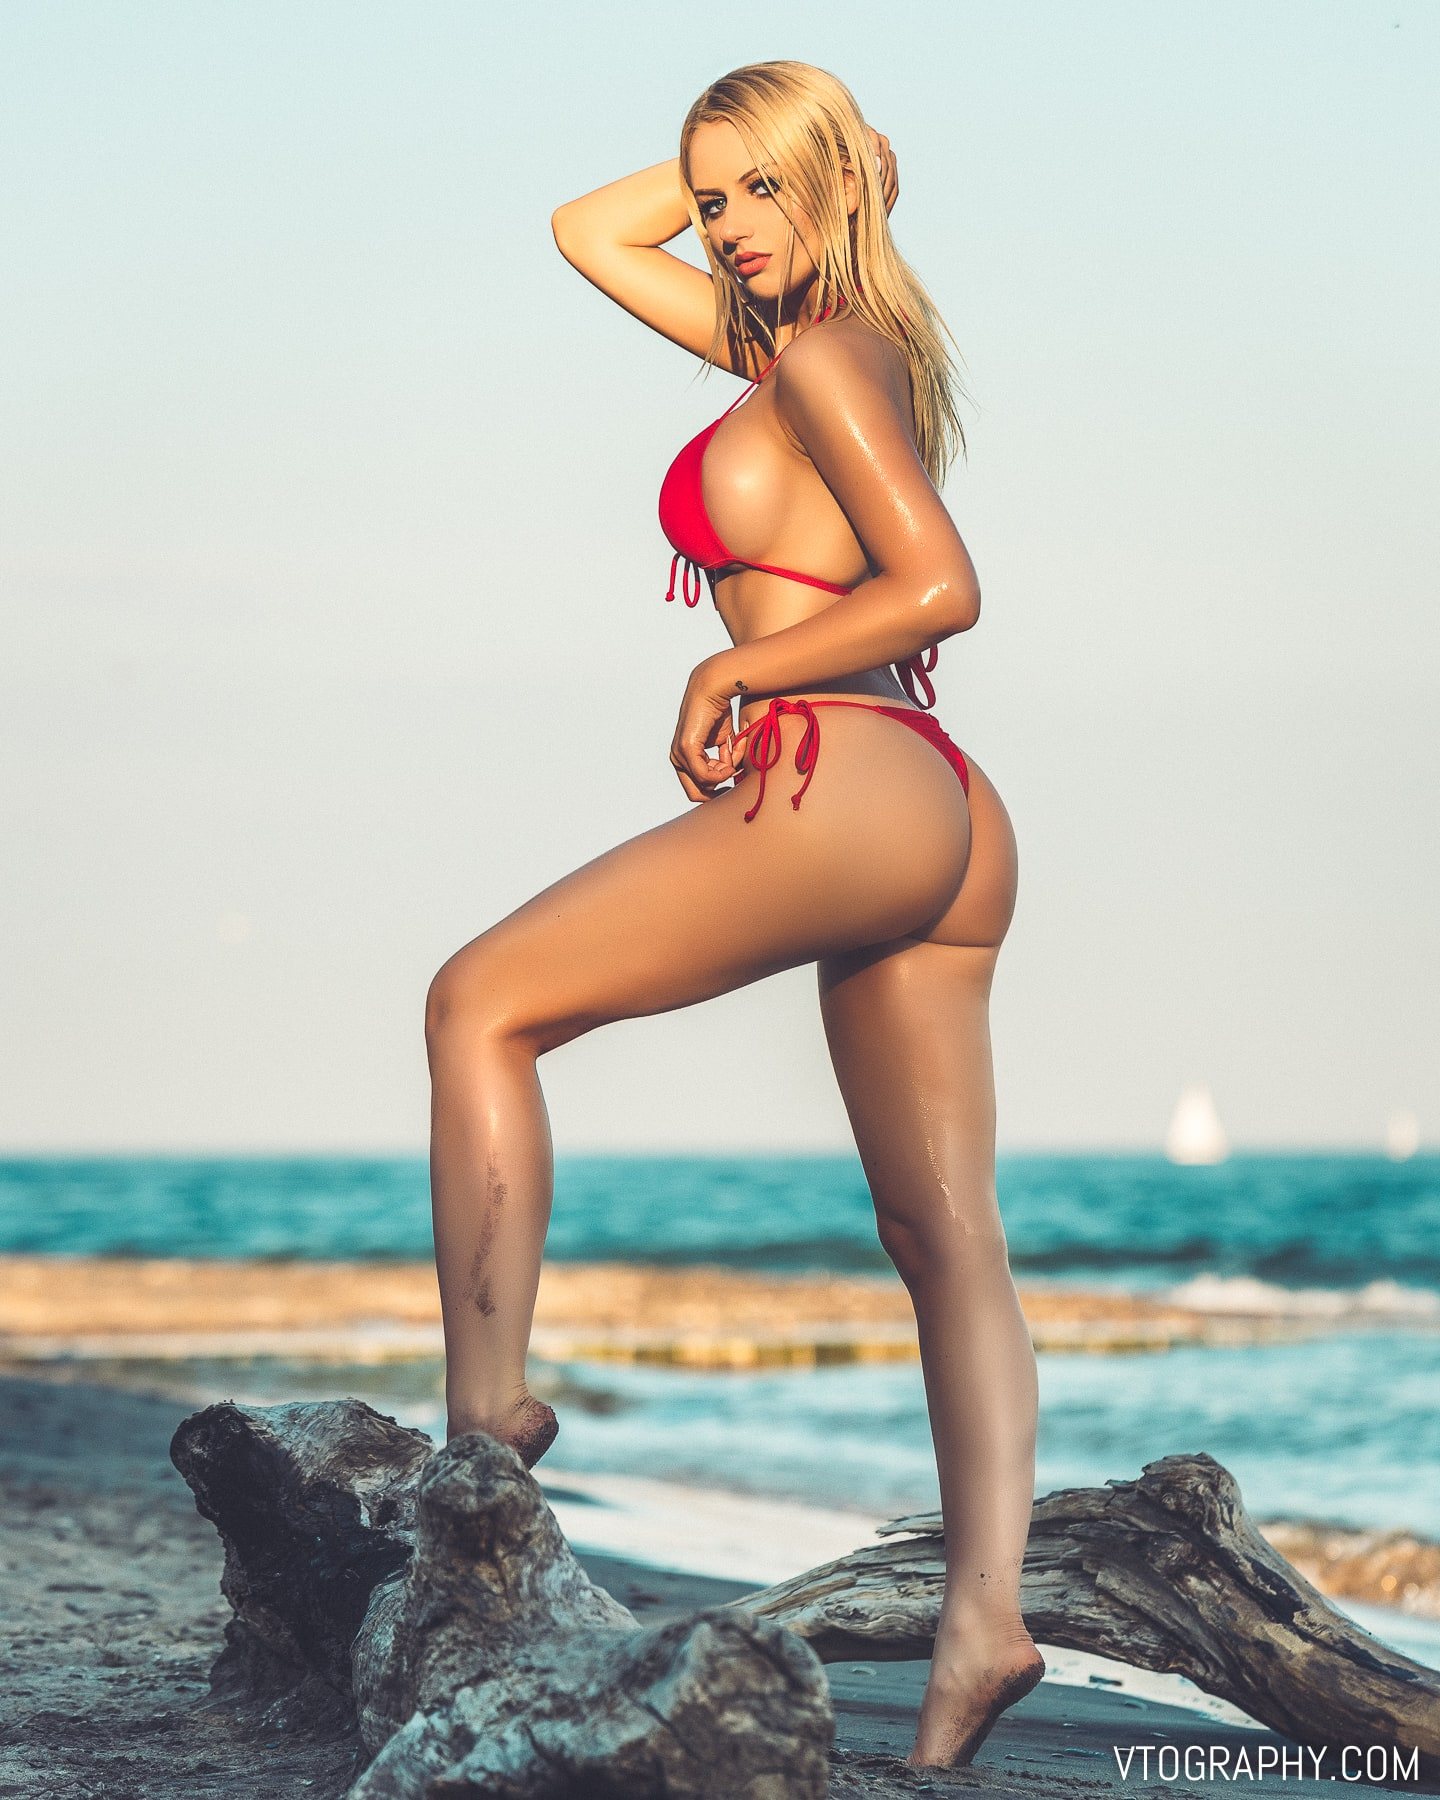 Valerie Muren nude beach photo shoot